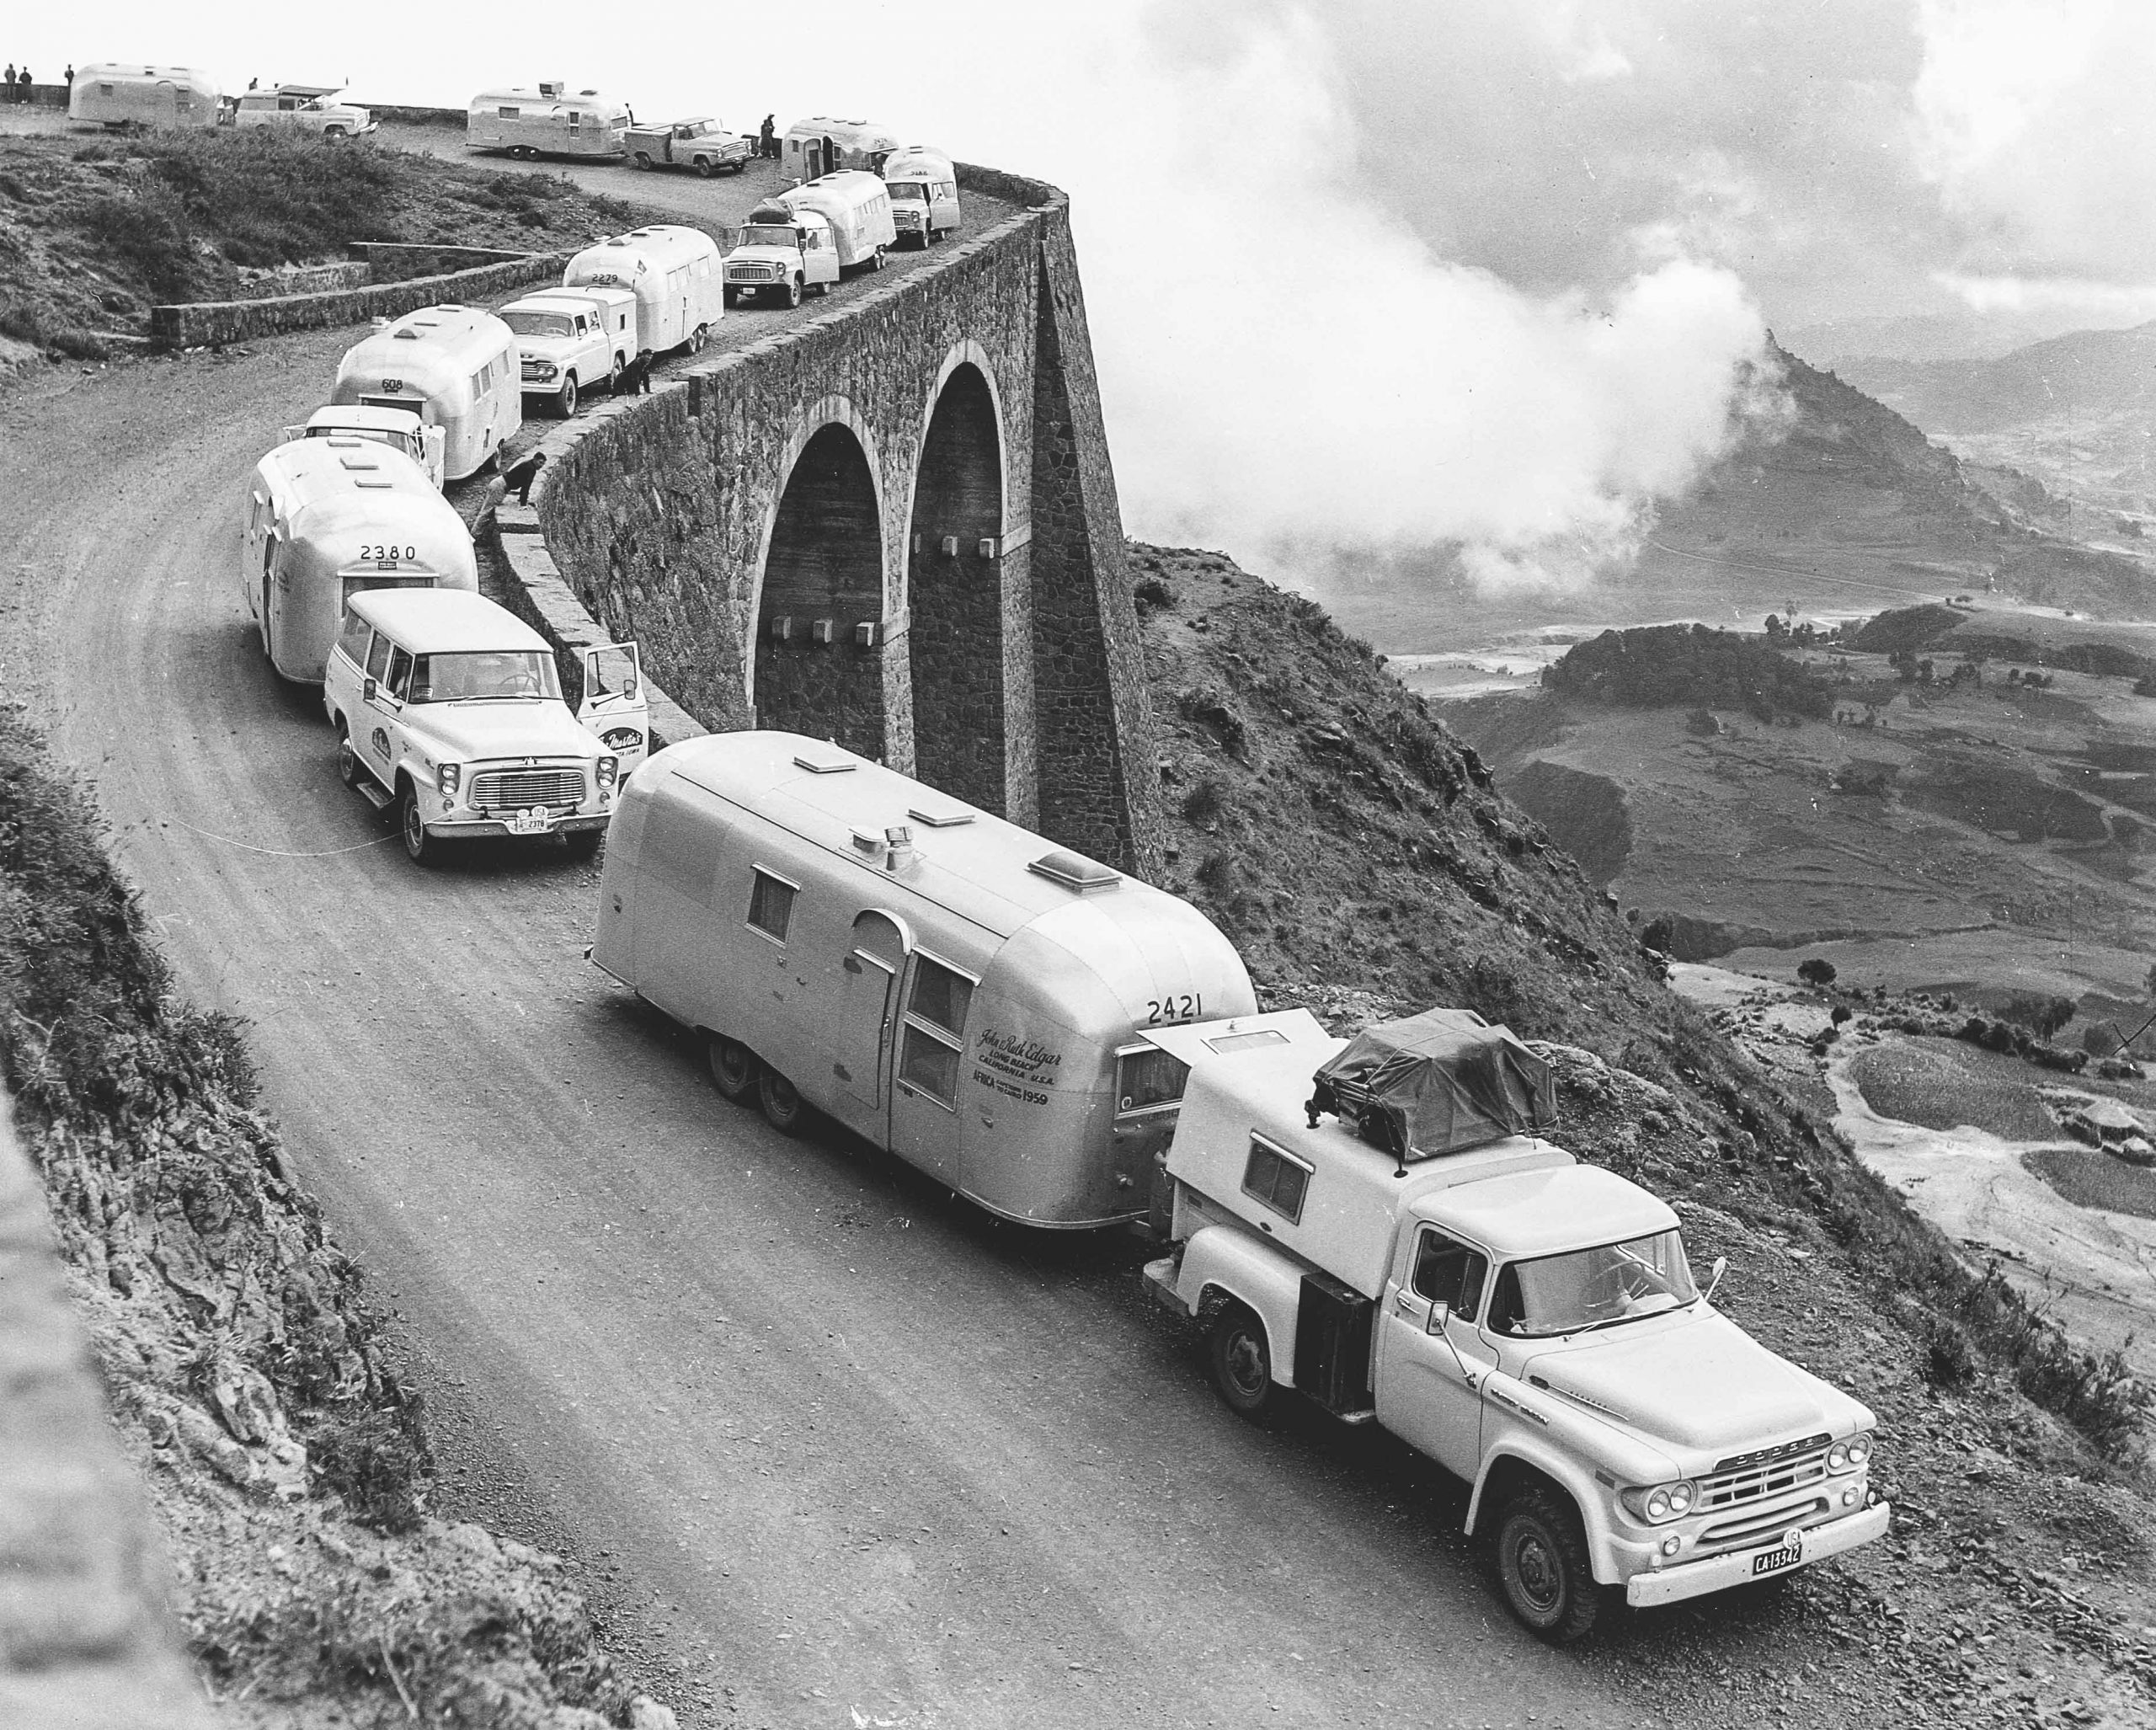 Airstream Caravan on Mountain Ledge